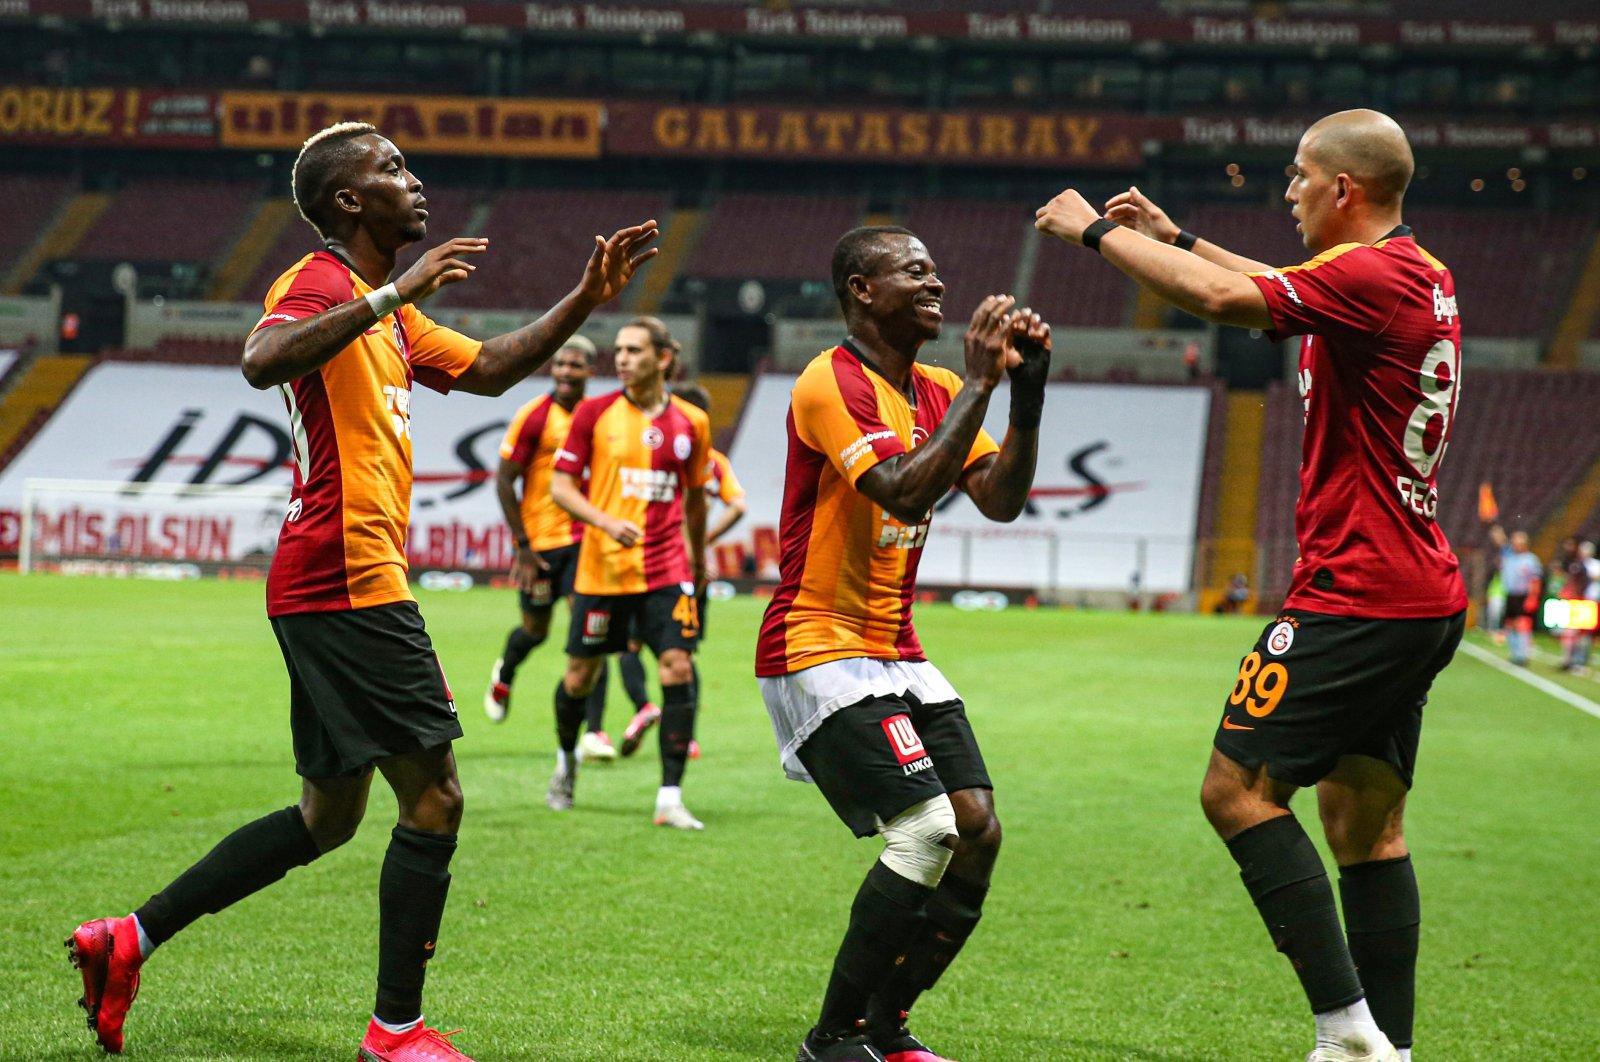 Galatasaray players celebrate a goal against Gaziantepspor, Gaziantep, Turkey, June 21, 2020. (AA Photo)